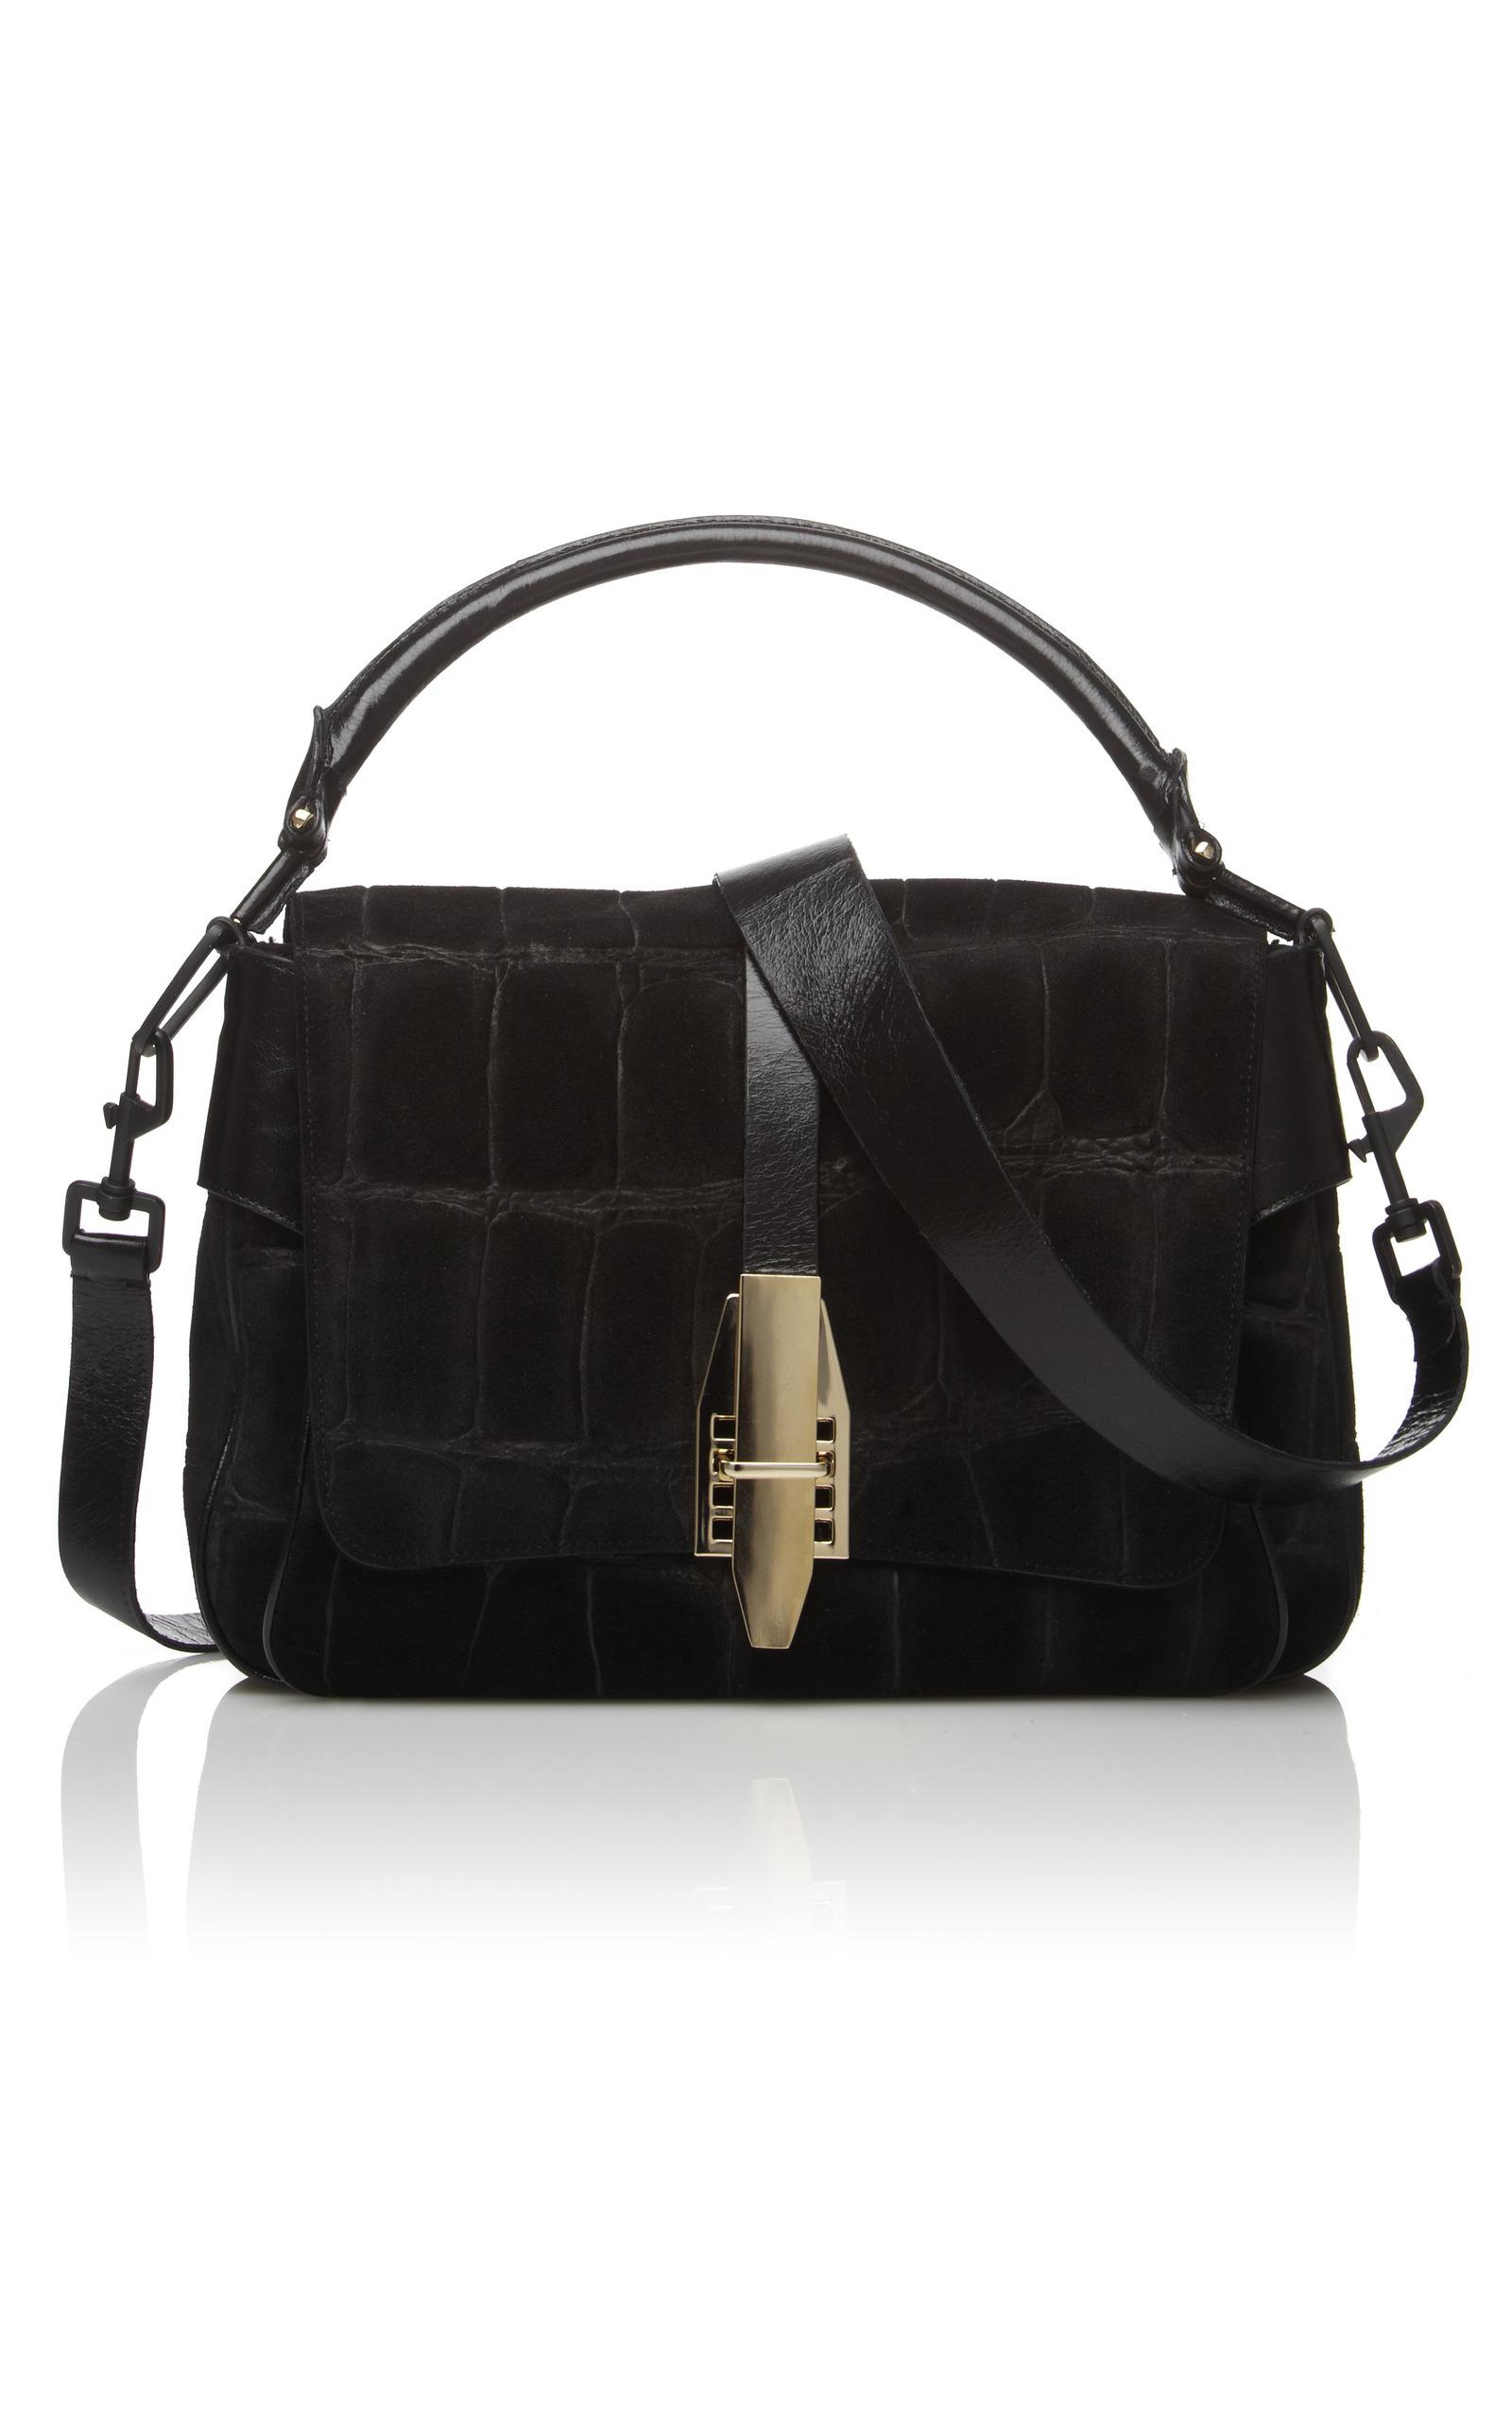 bcc7d7ba26 Willa Abuk Shoulder Bag by Theyskens' Theory | Moda Operandi